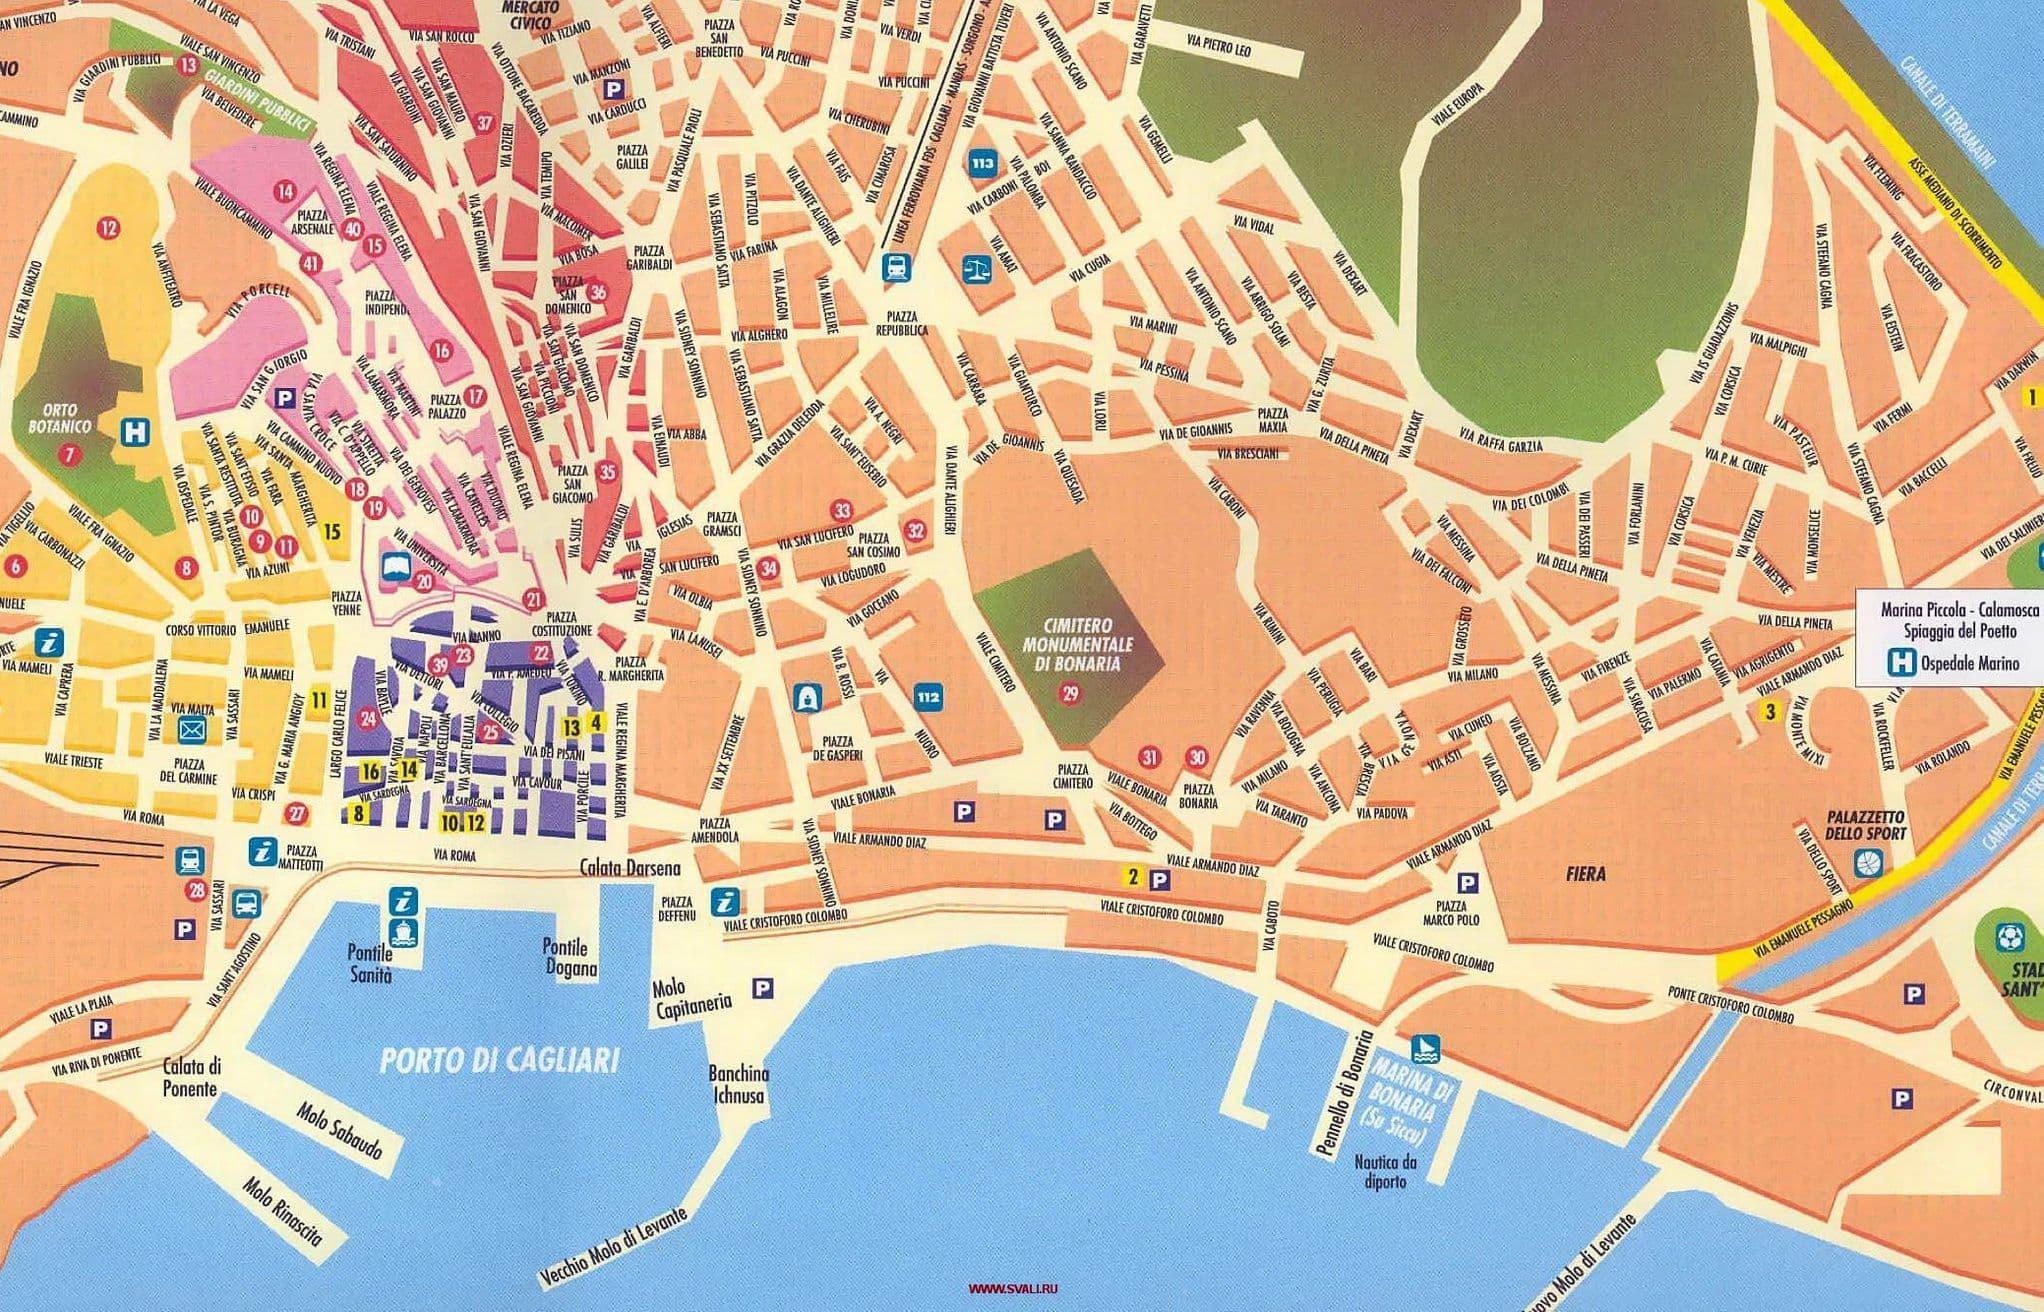 recensioni evasioni cagliari map - photo#1